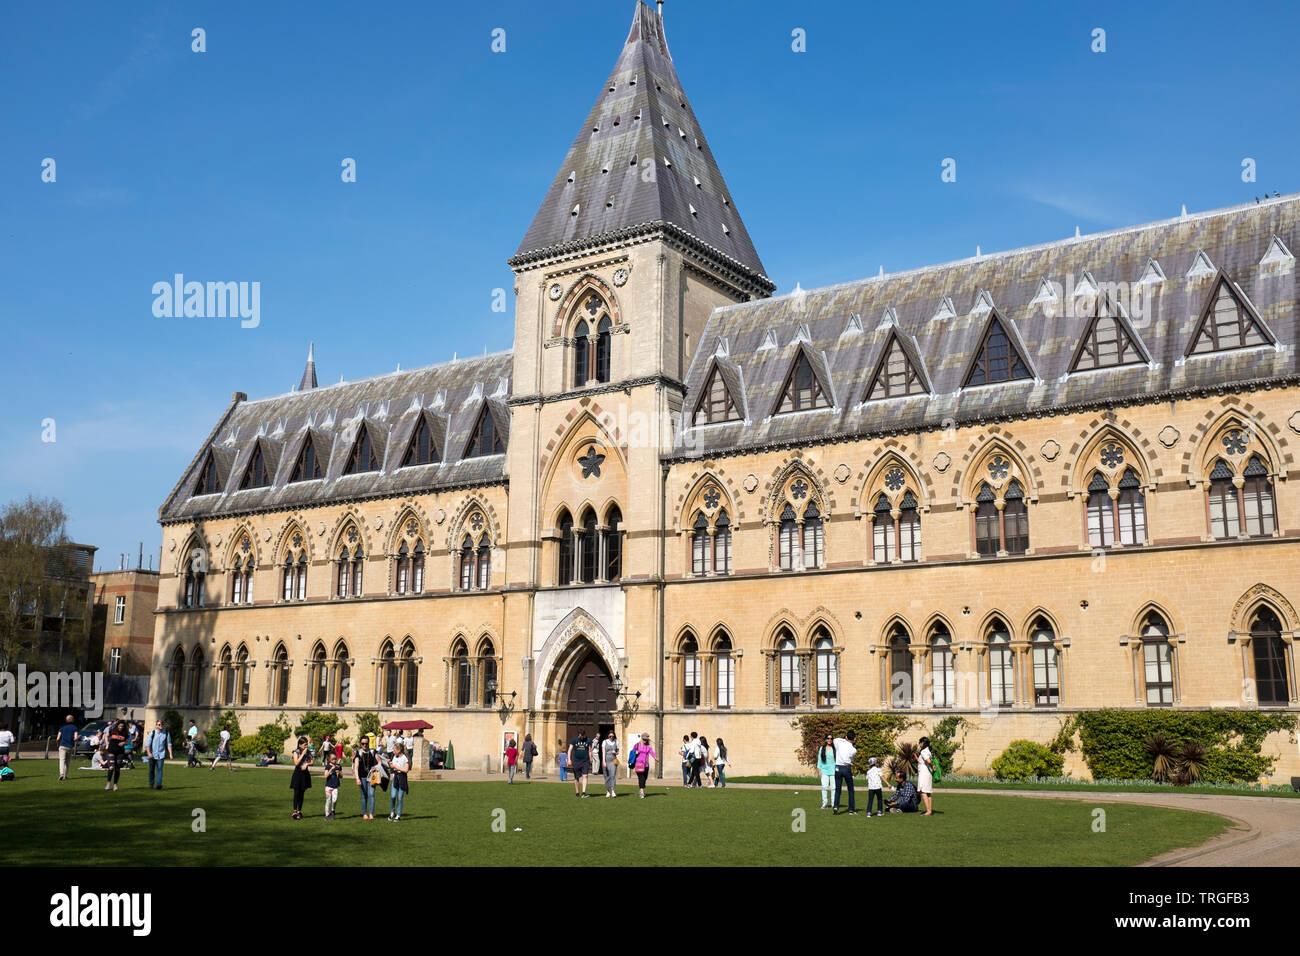 Pitt Rivers Museum - University of Oxford - Stock Image